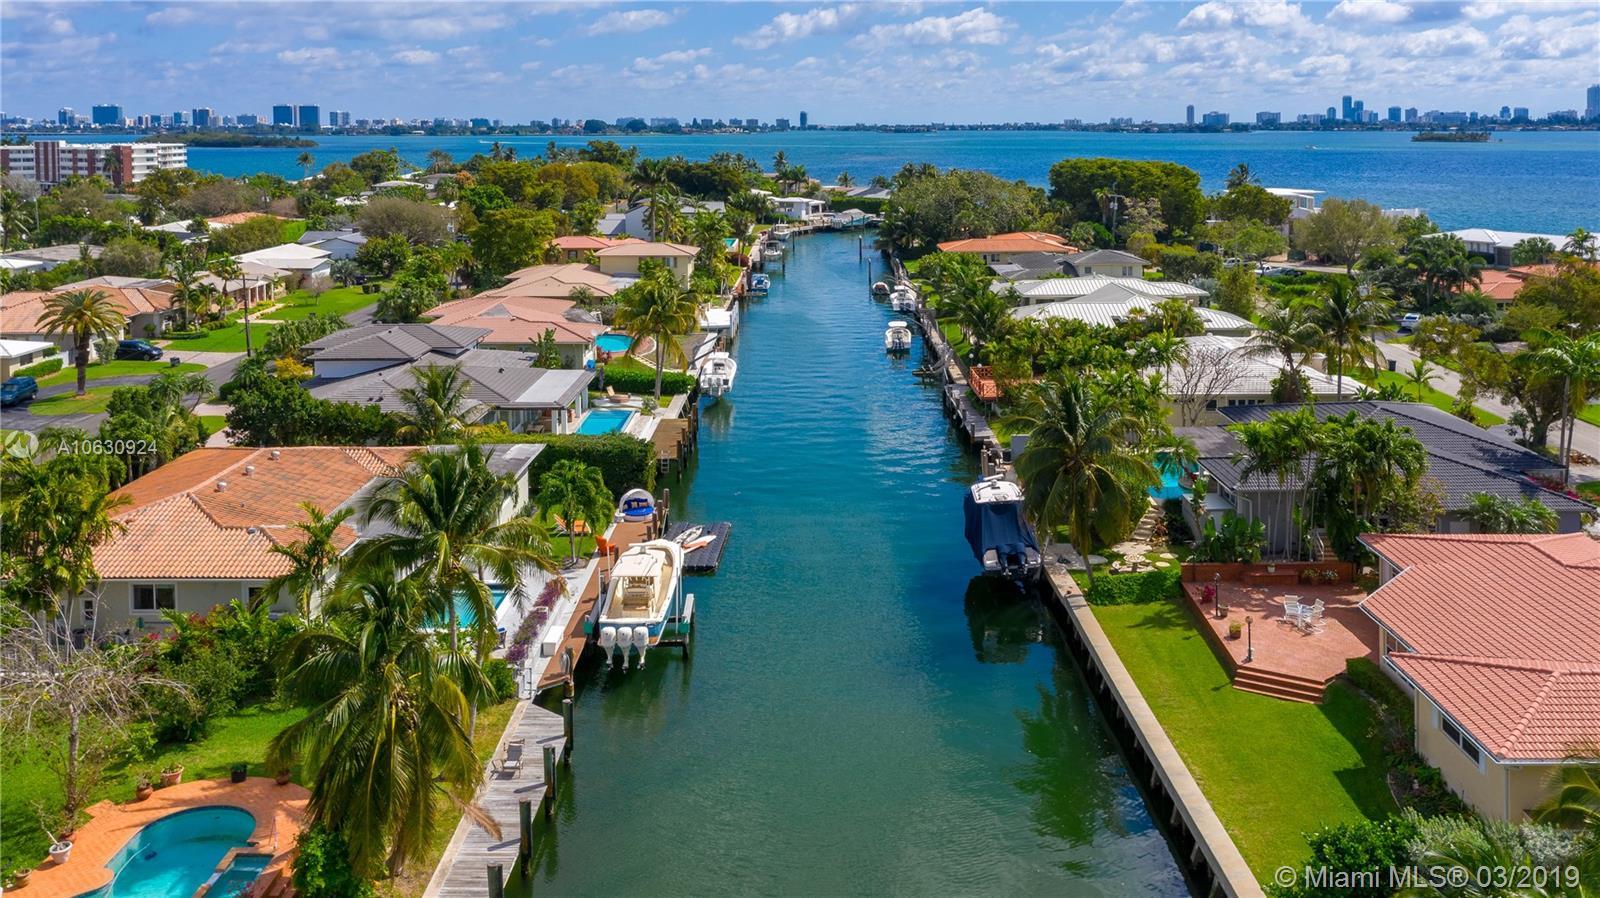 1360 NE 103rd St, Miami Shores, FL 33138